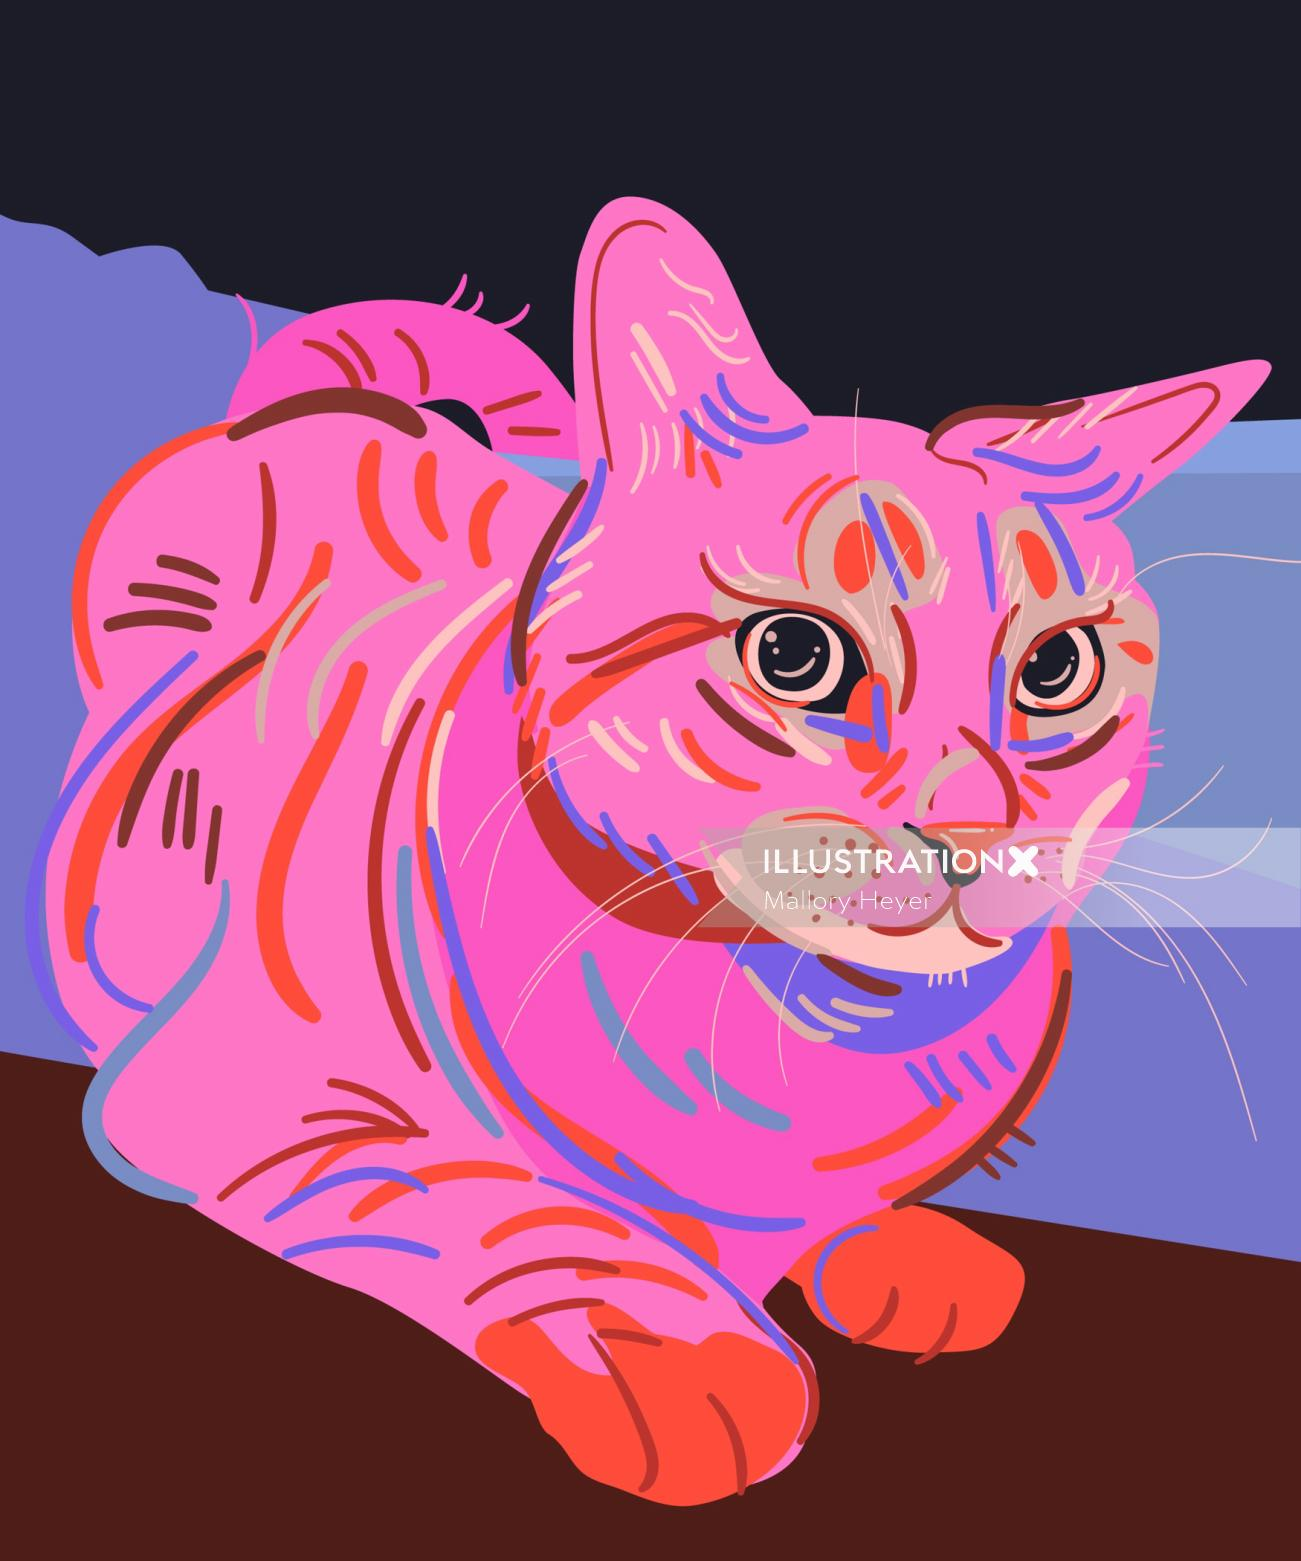 Portrait illustration of cat by Mallory Heyer